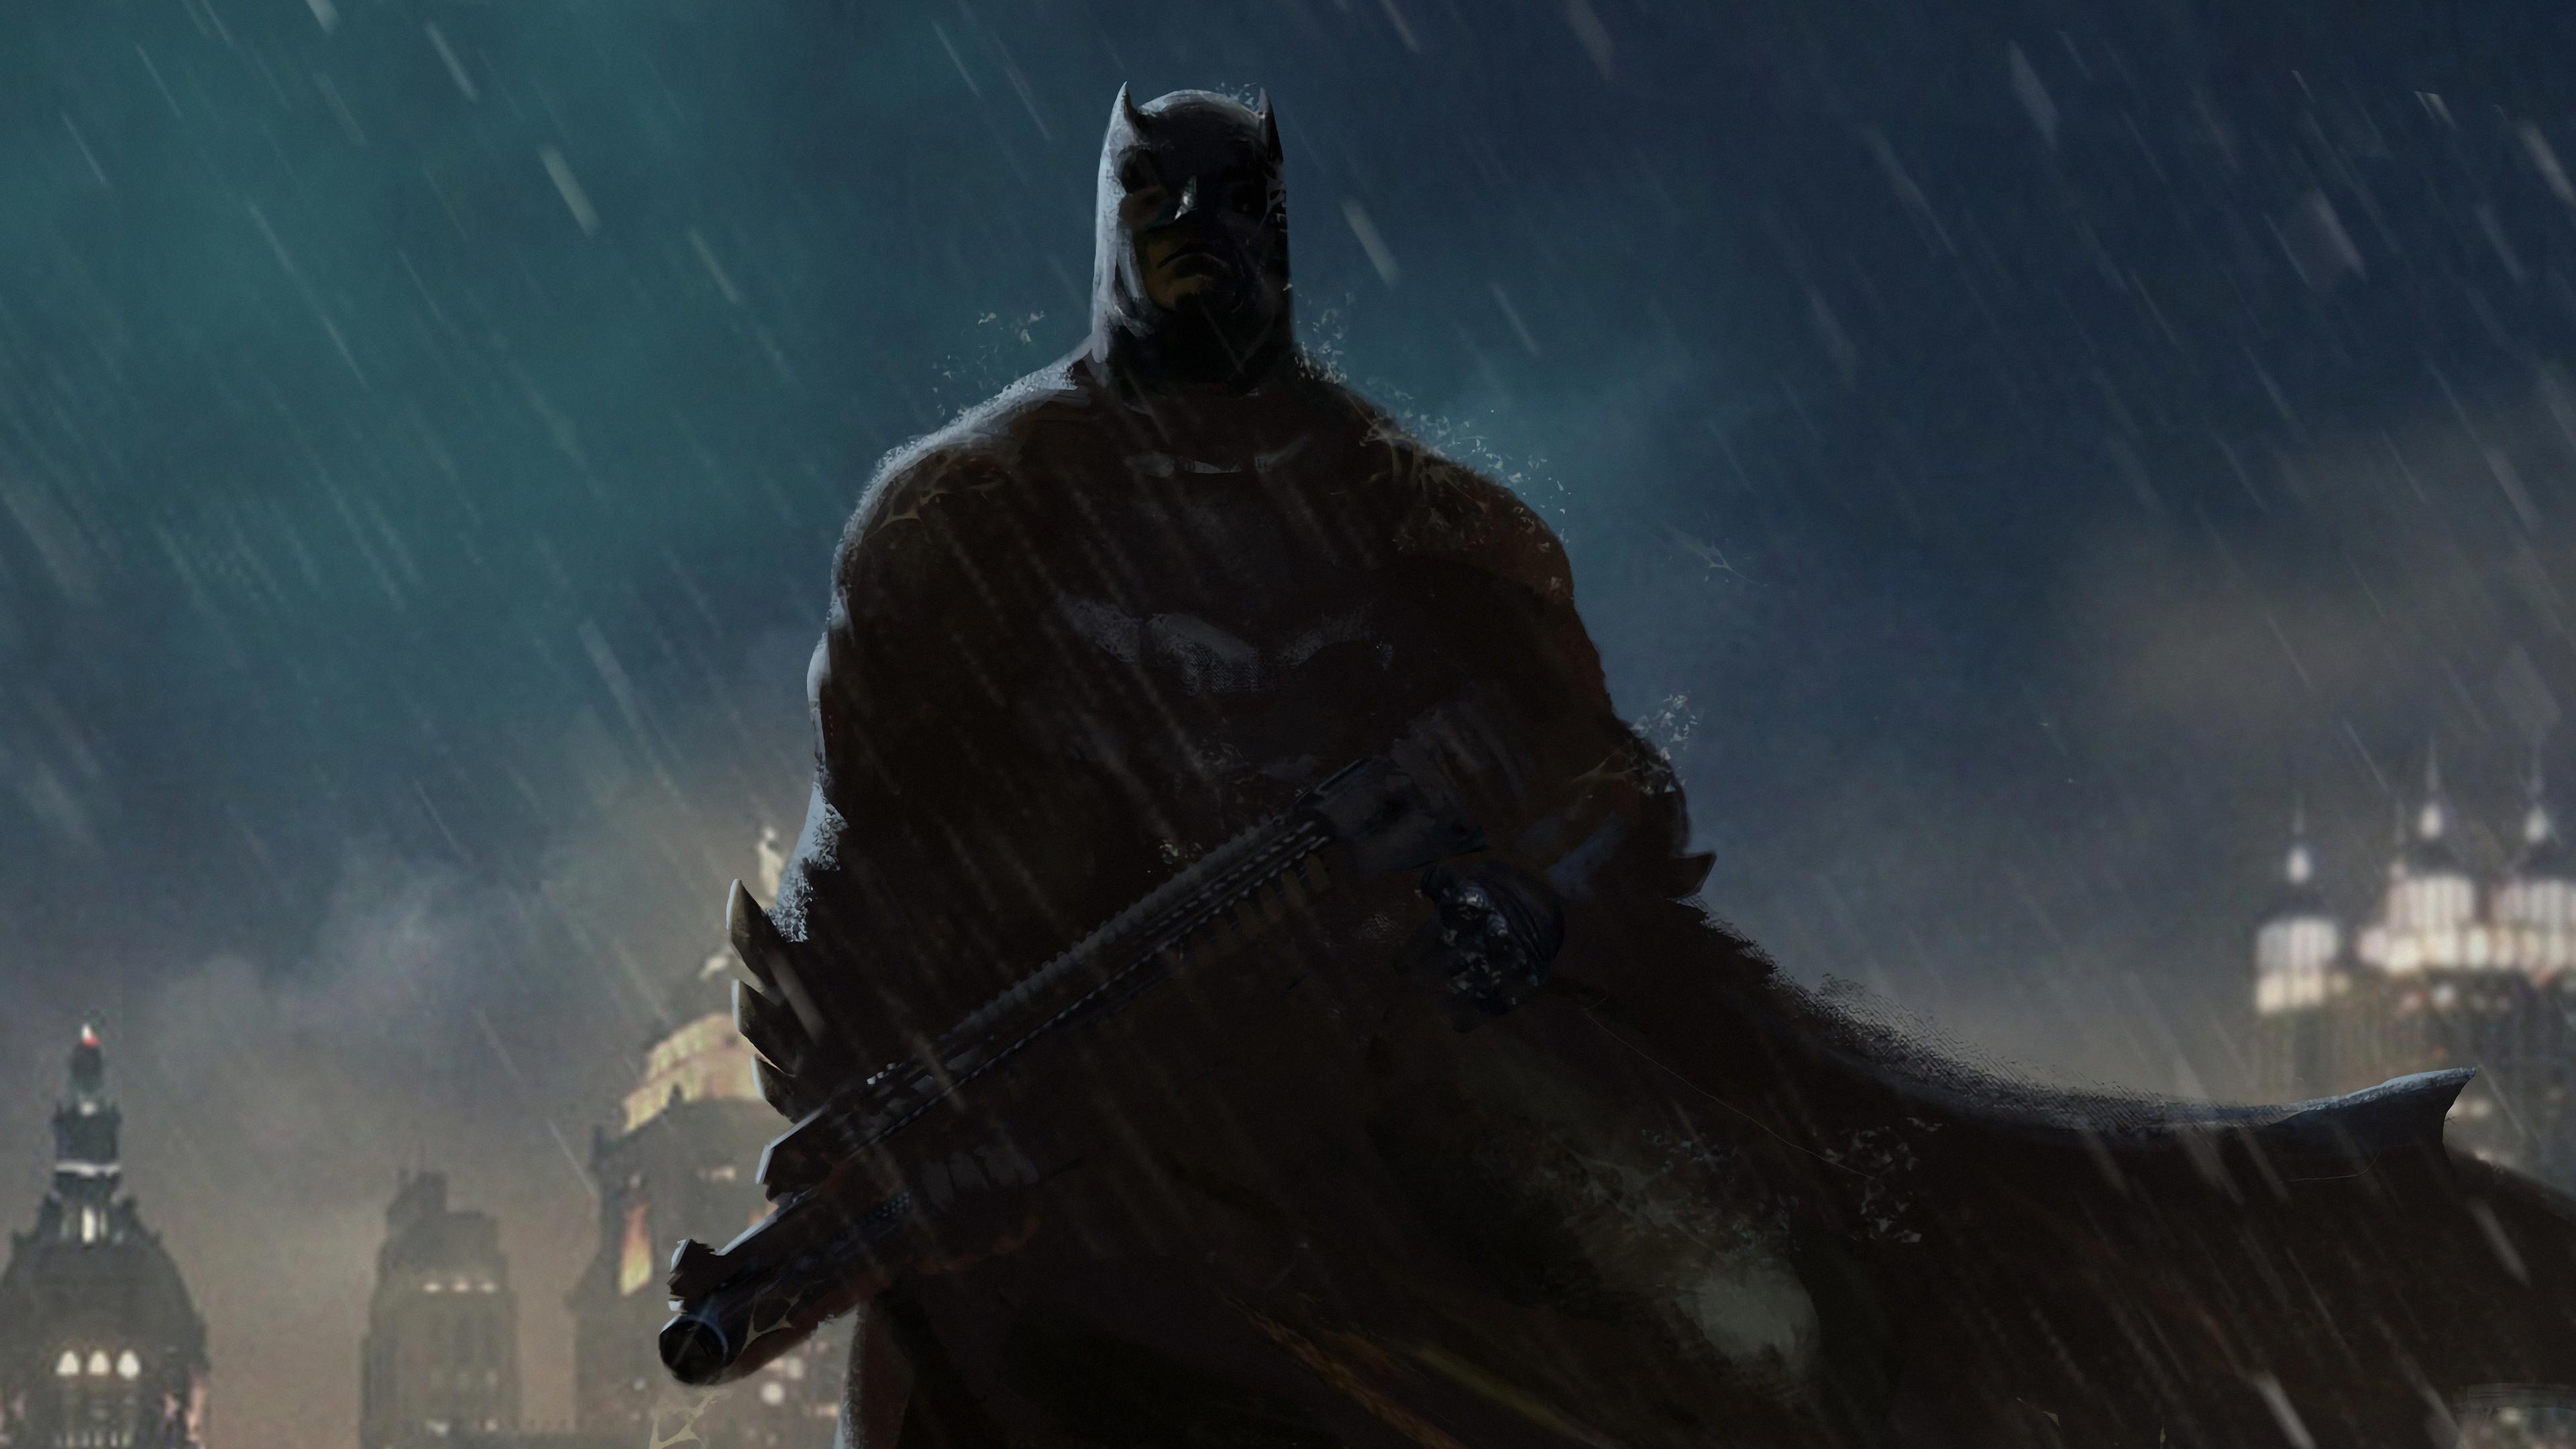 batman above 1572368688 - Batman Above - superheroes wallpapers, hd-wallpapers, digital art wallpapers, batman wallpapers, artwork wallpapers, artstation wallpapers, 4k-wallpapers